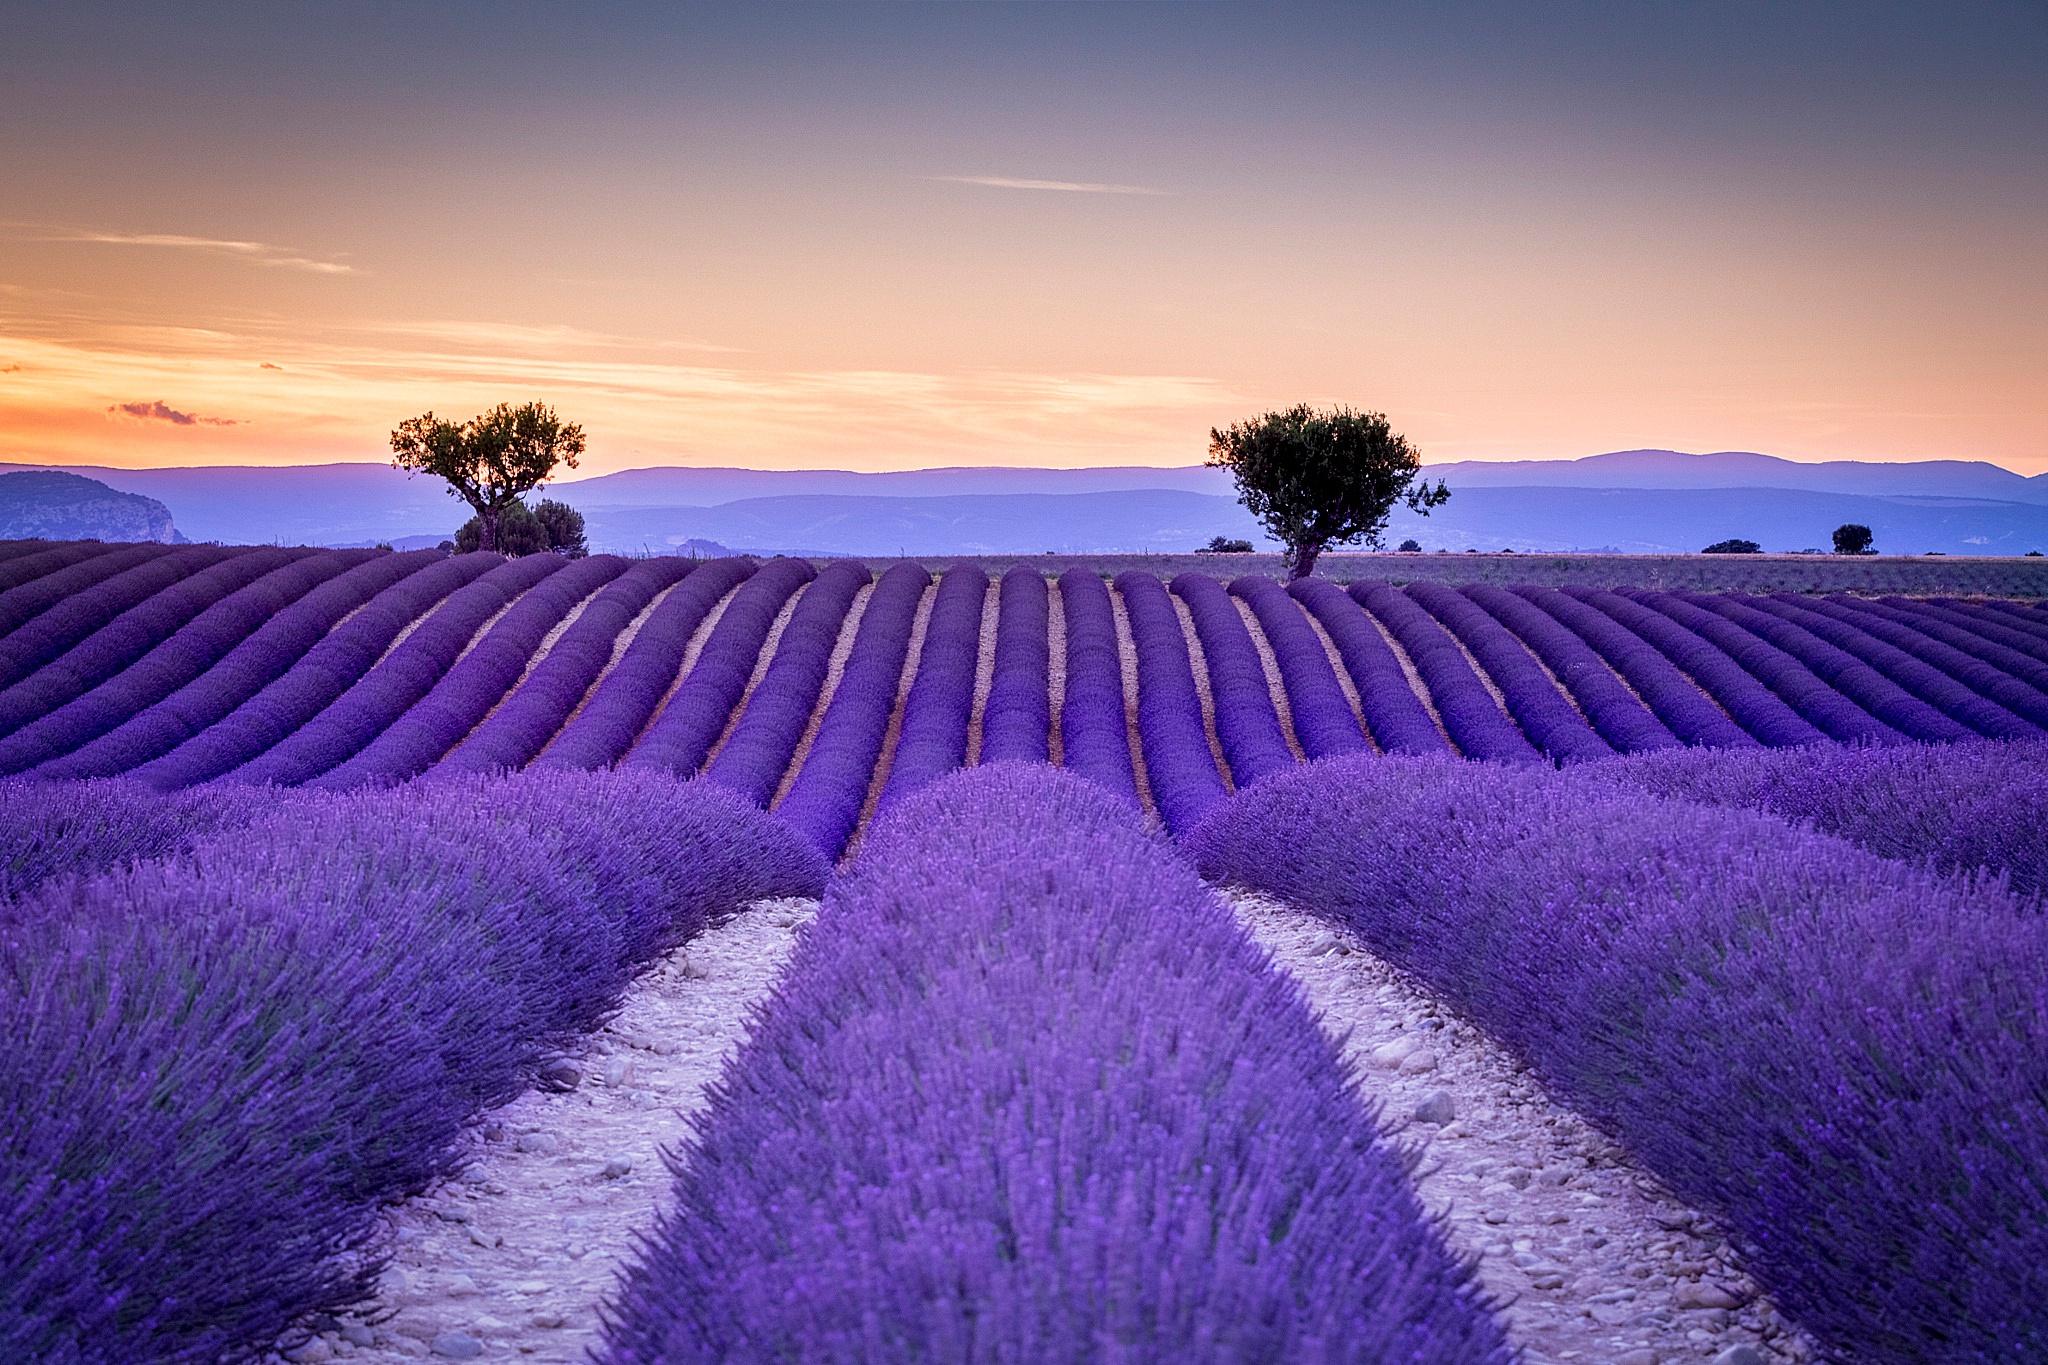 dünya wallpaper,lavender,lavender,english lavender,sky,purple